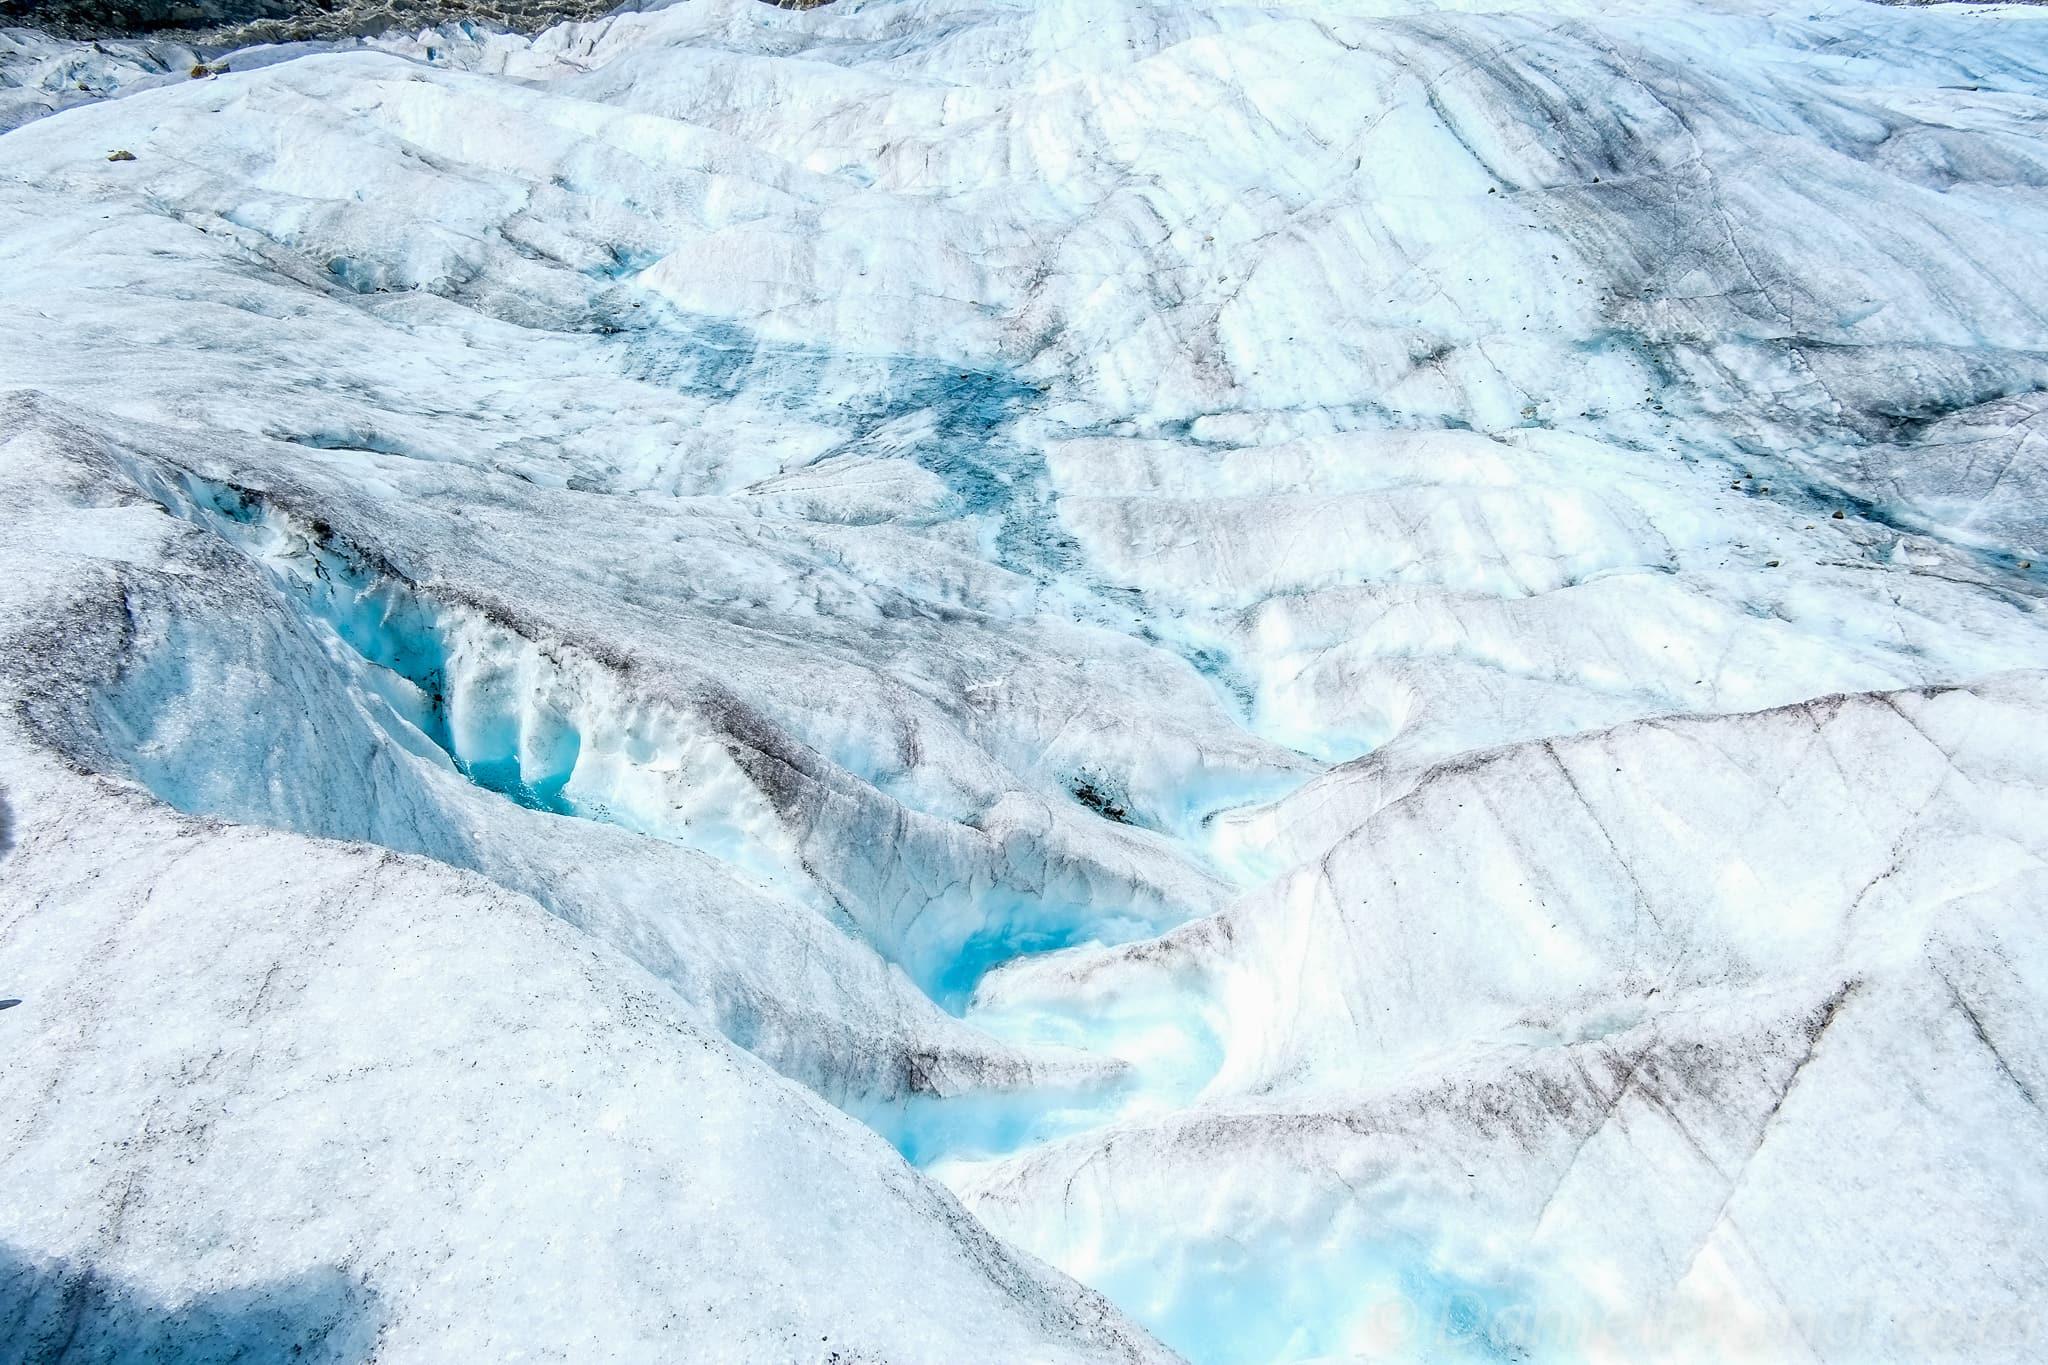 Glacier   https://www.flickr.com/photos/danielpfund/